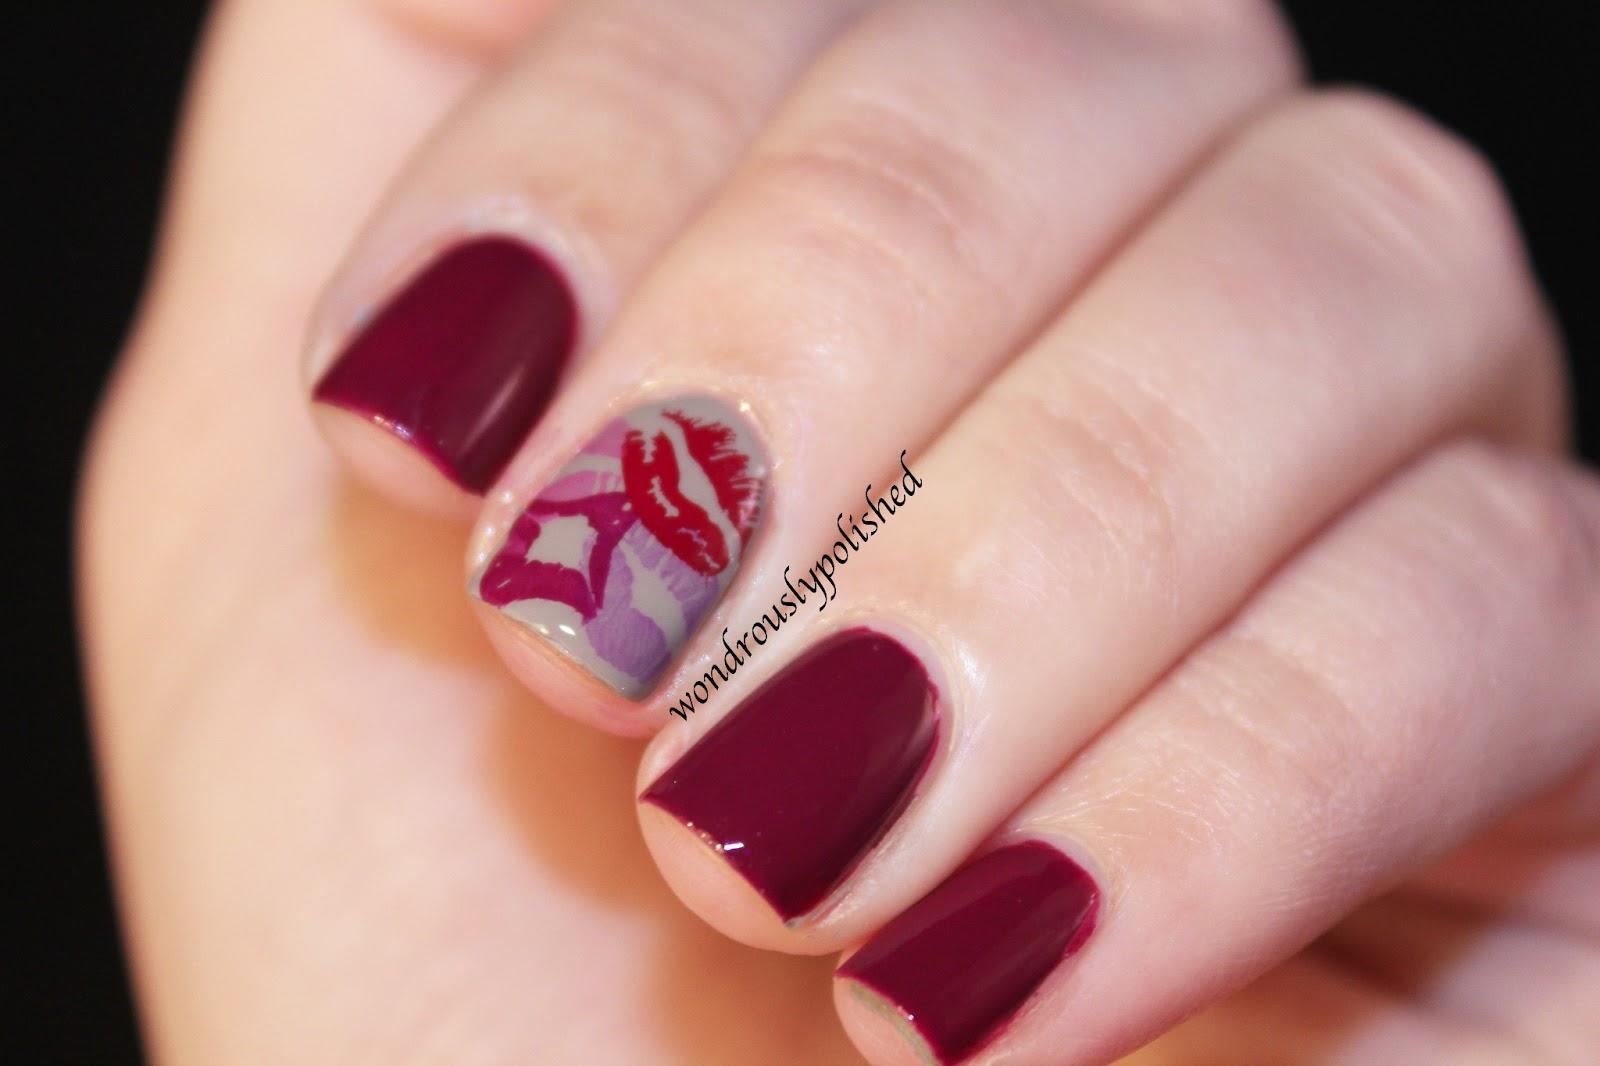 Wondrously Polished: February Nail Art Challenge - Day: Smooch!